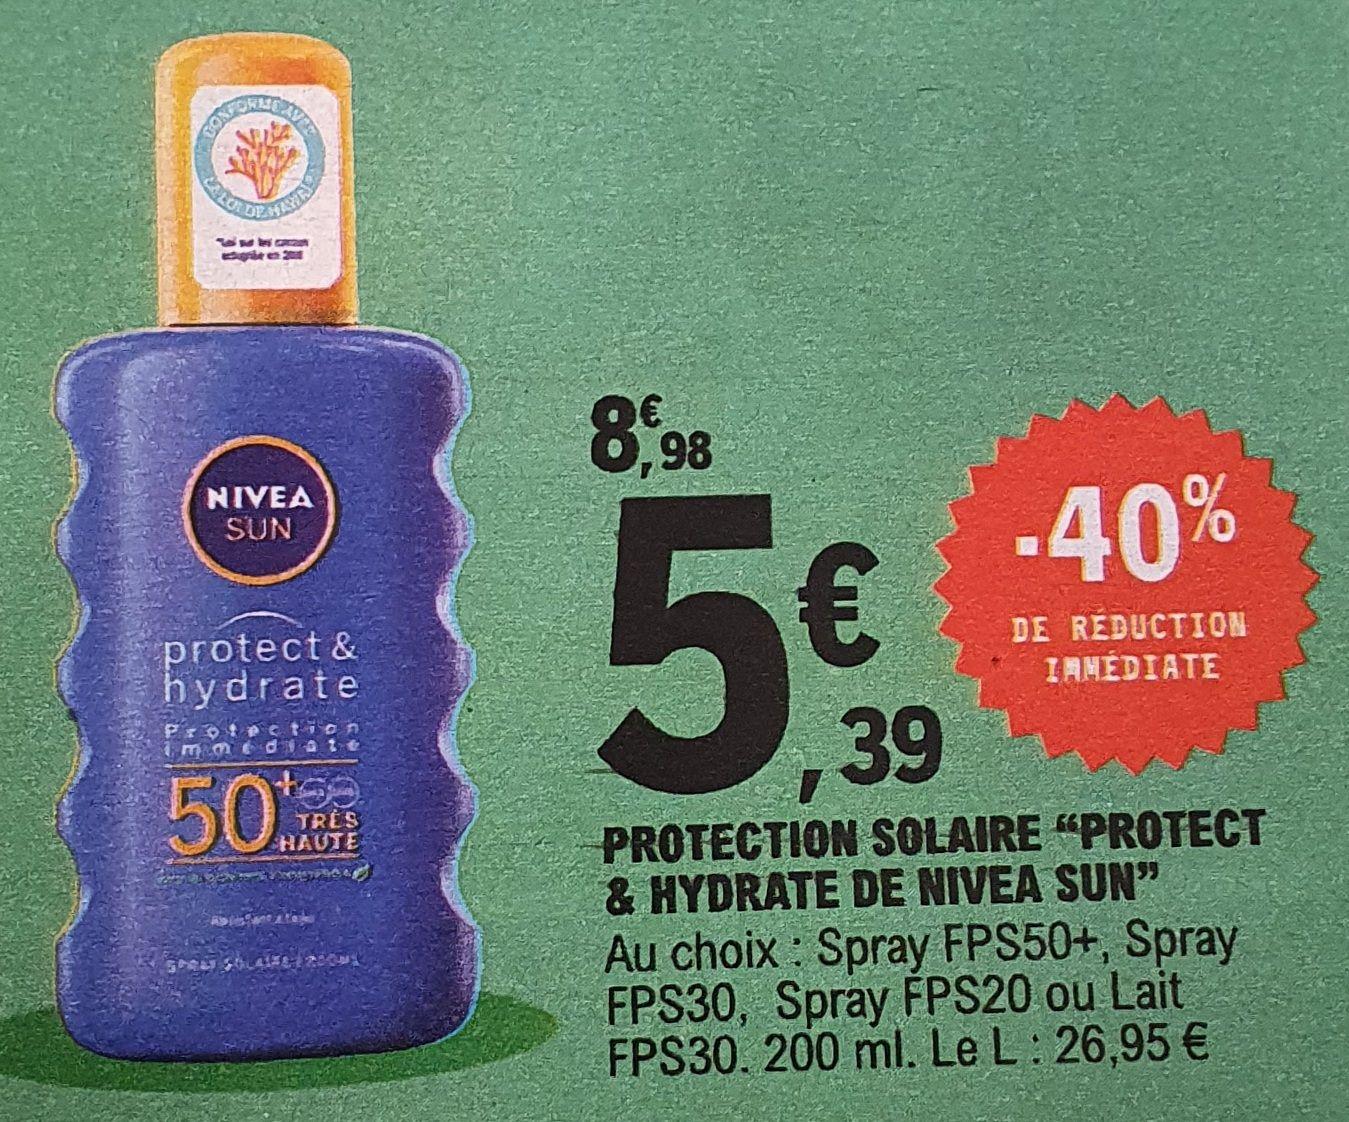 Protection solaire Nivea Sun Protect & Hydrate - 200ml